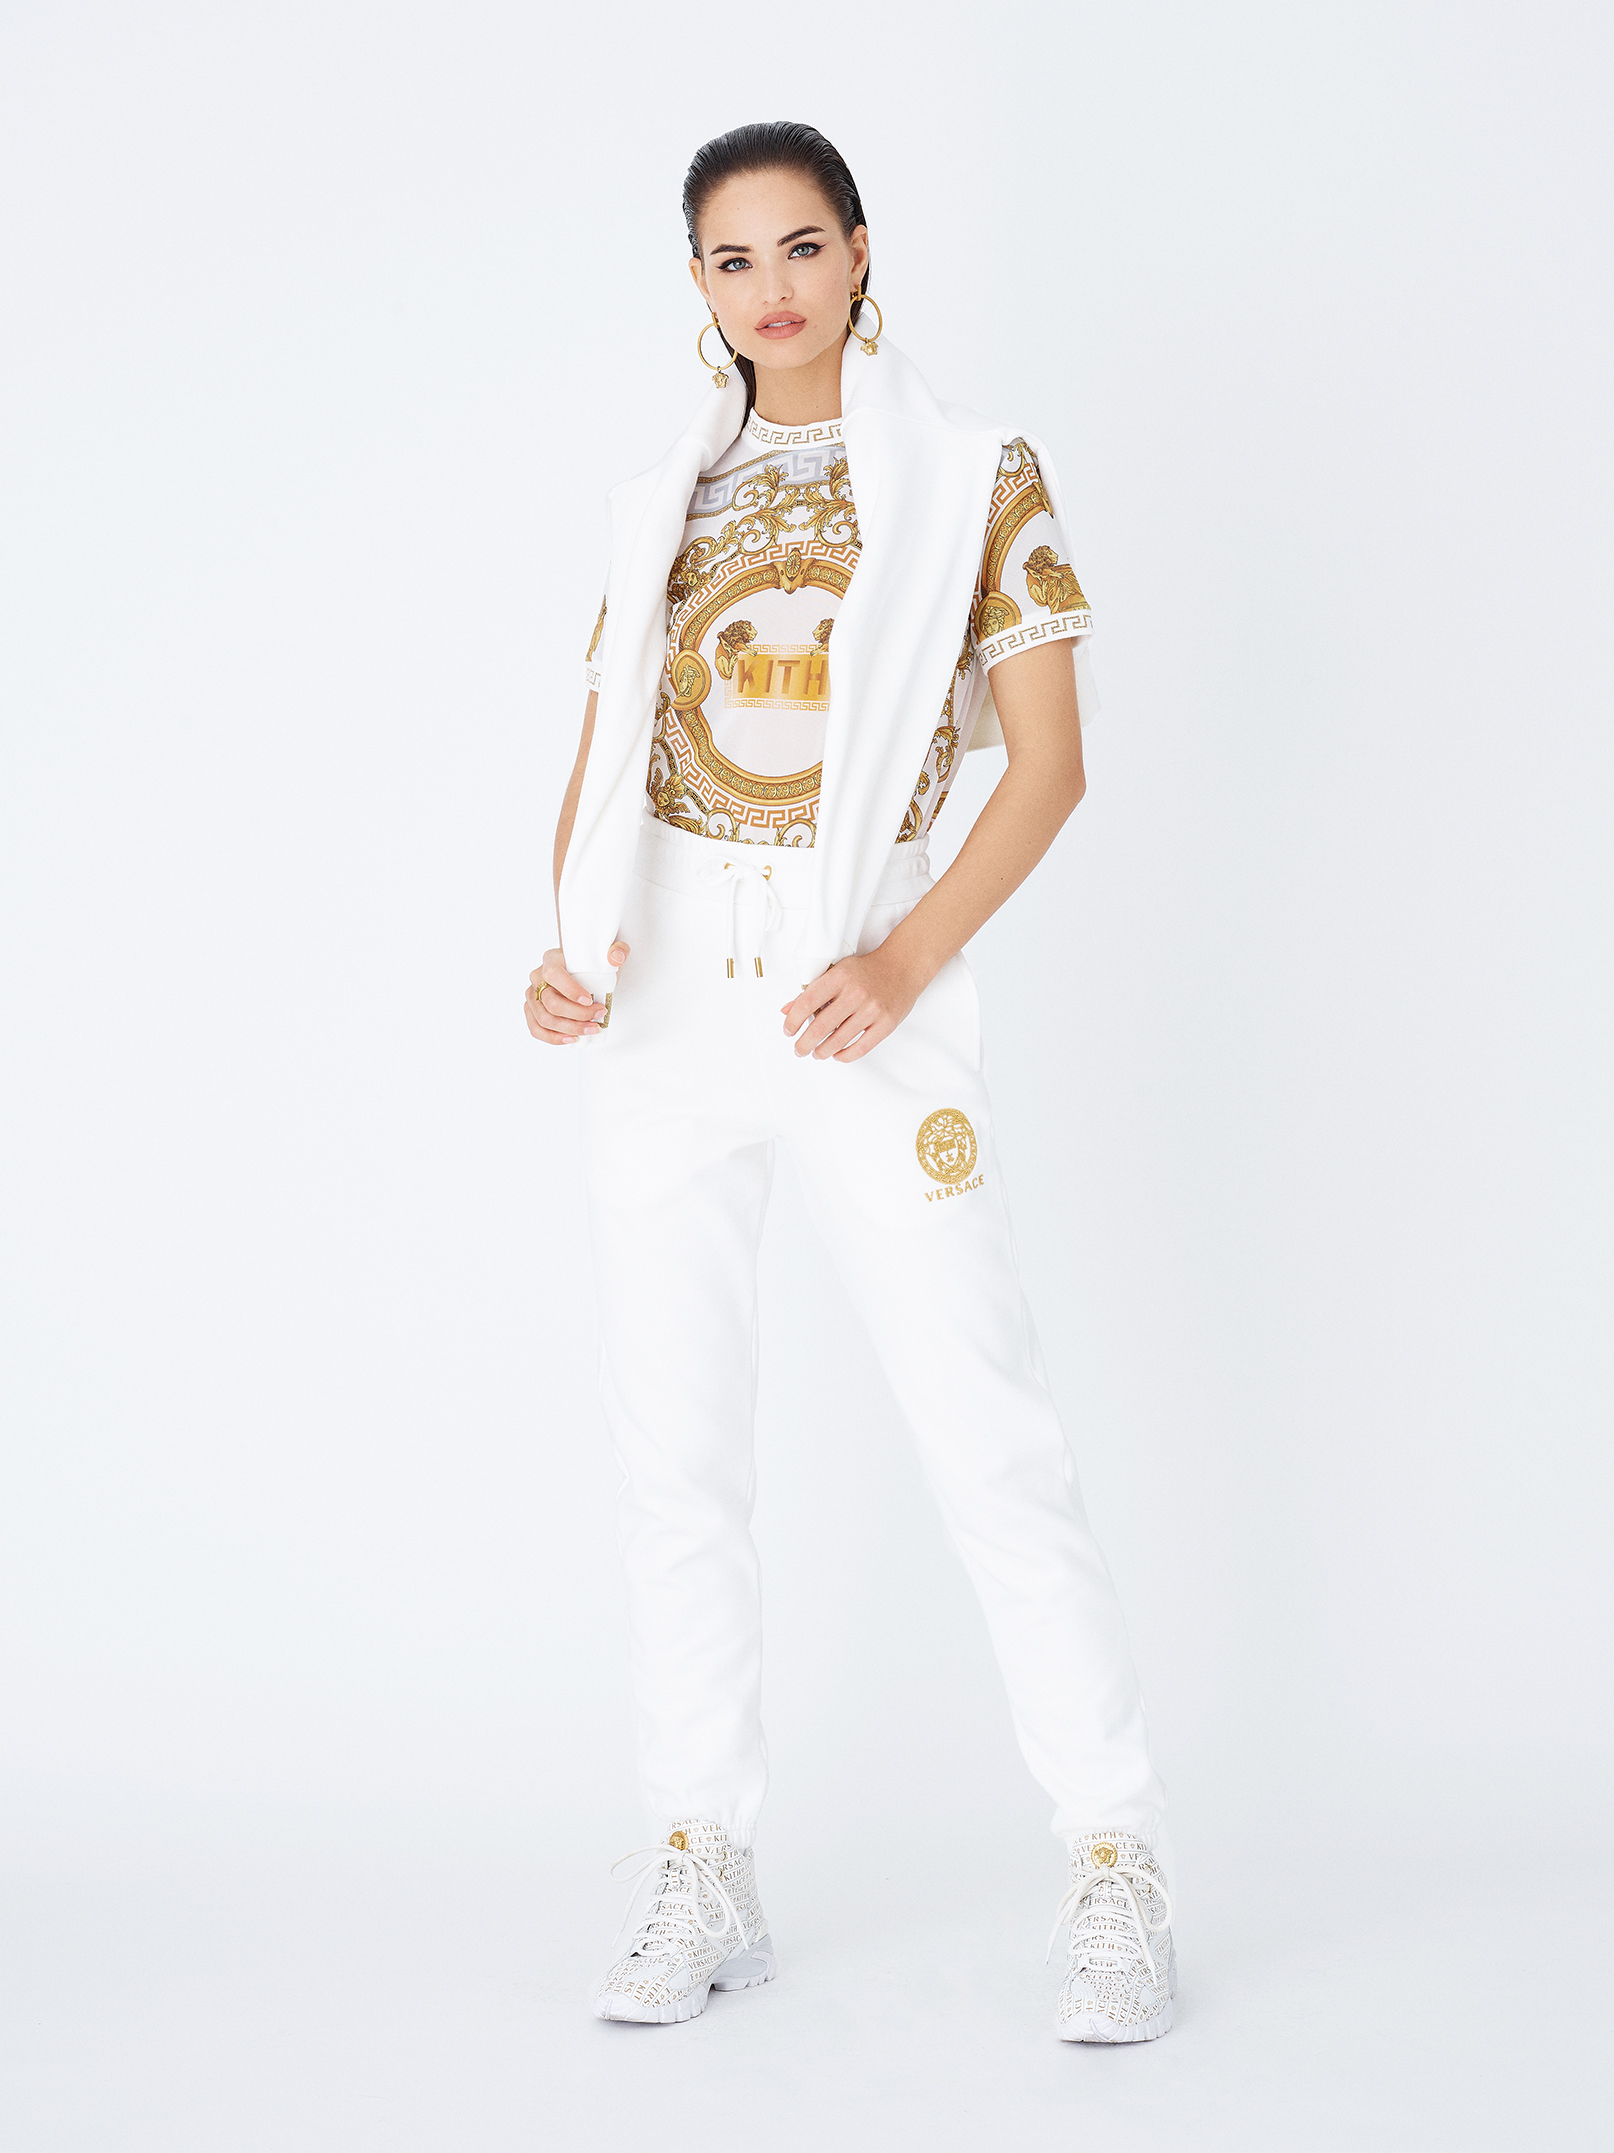 Kith Women X Versace Mesh Top, $475